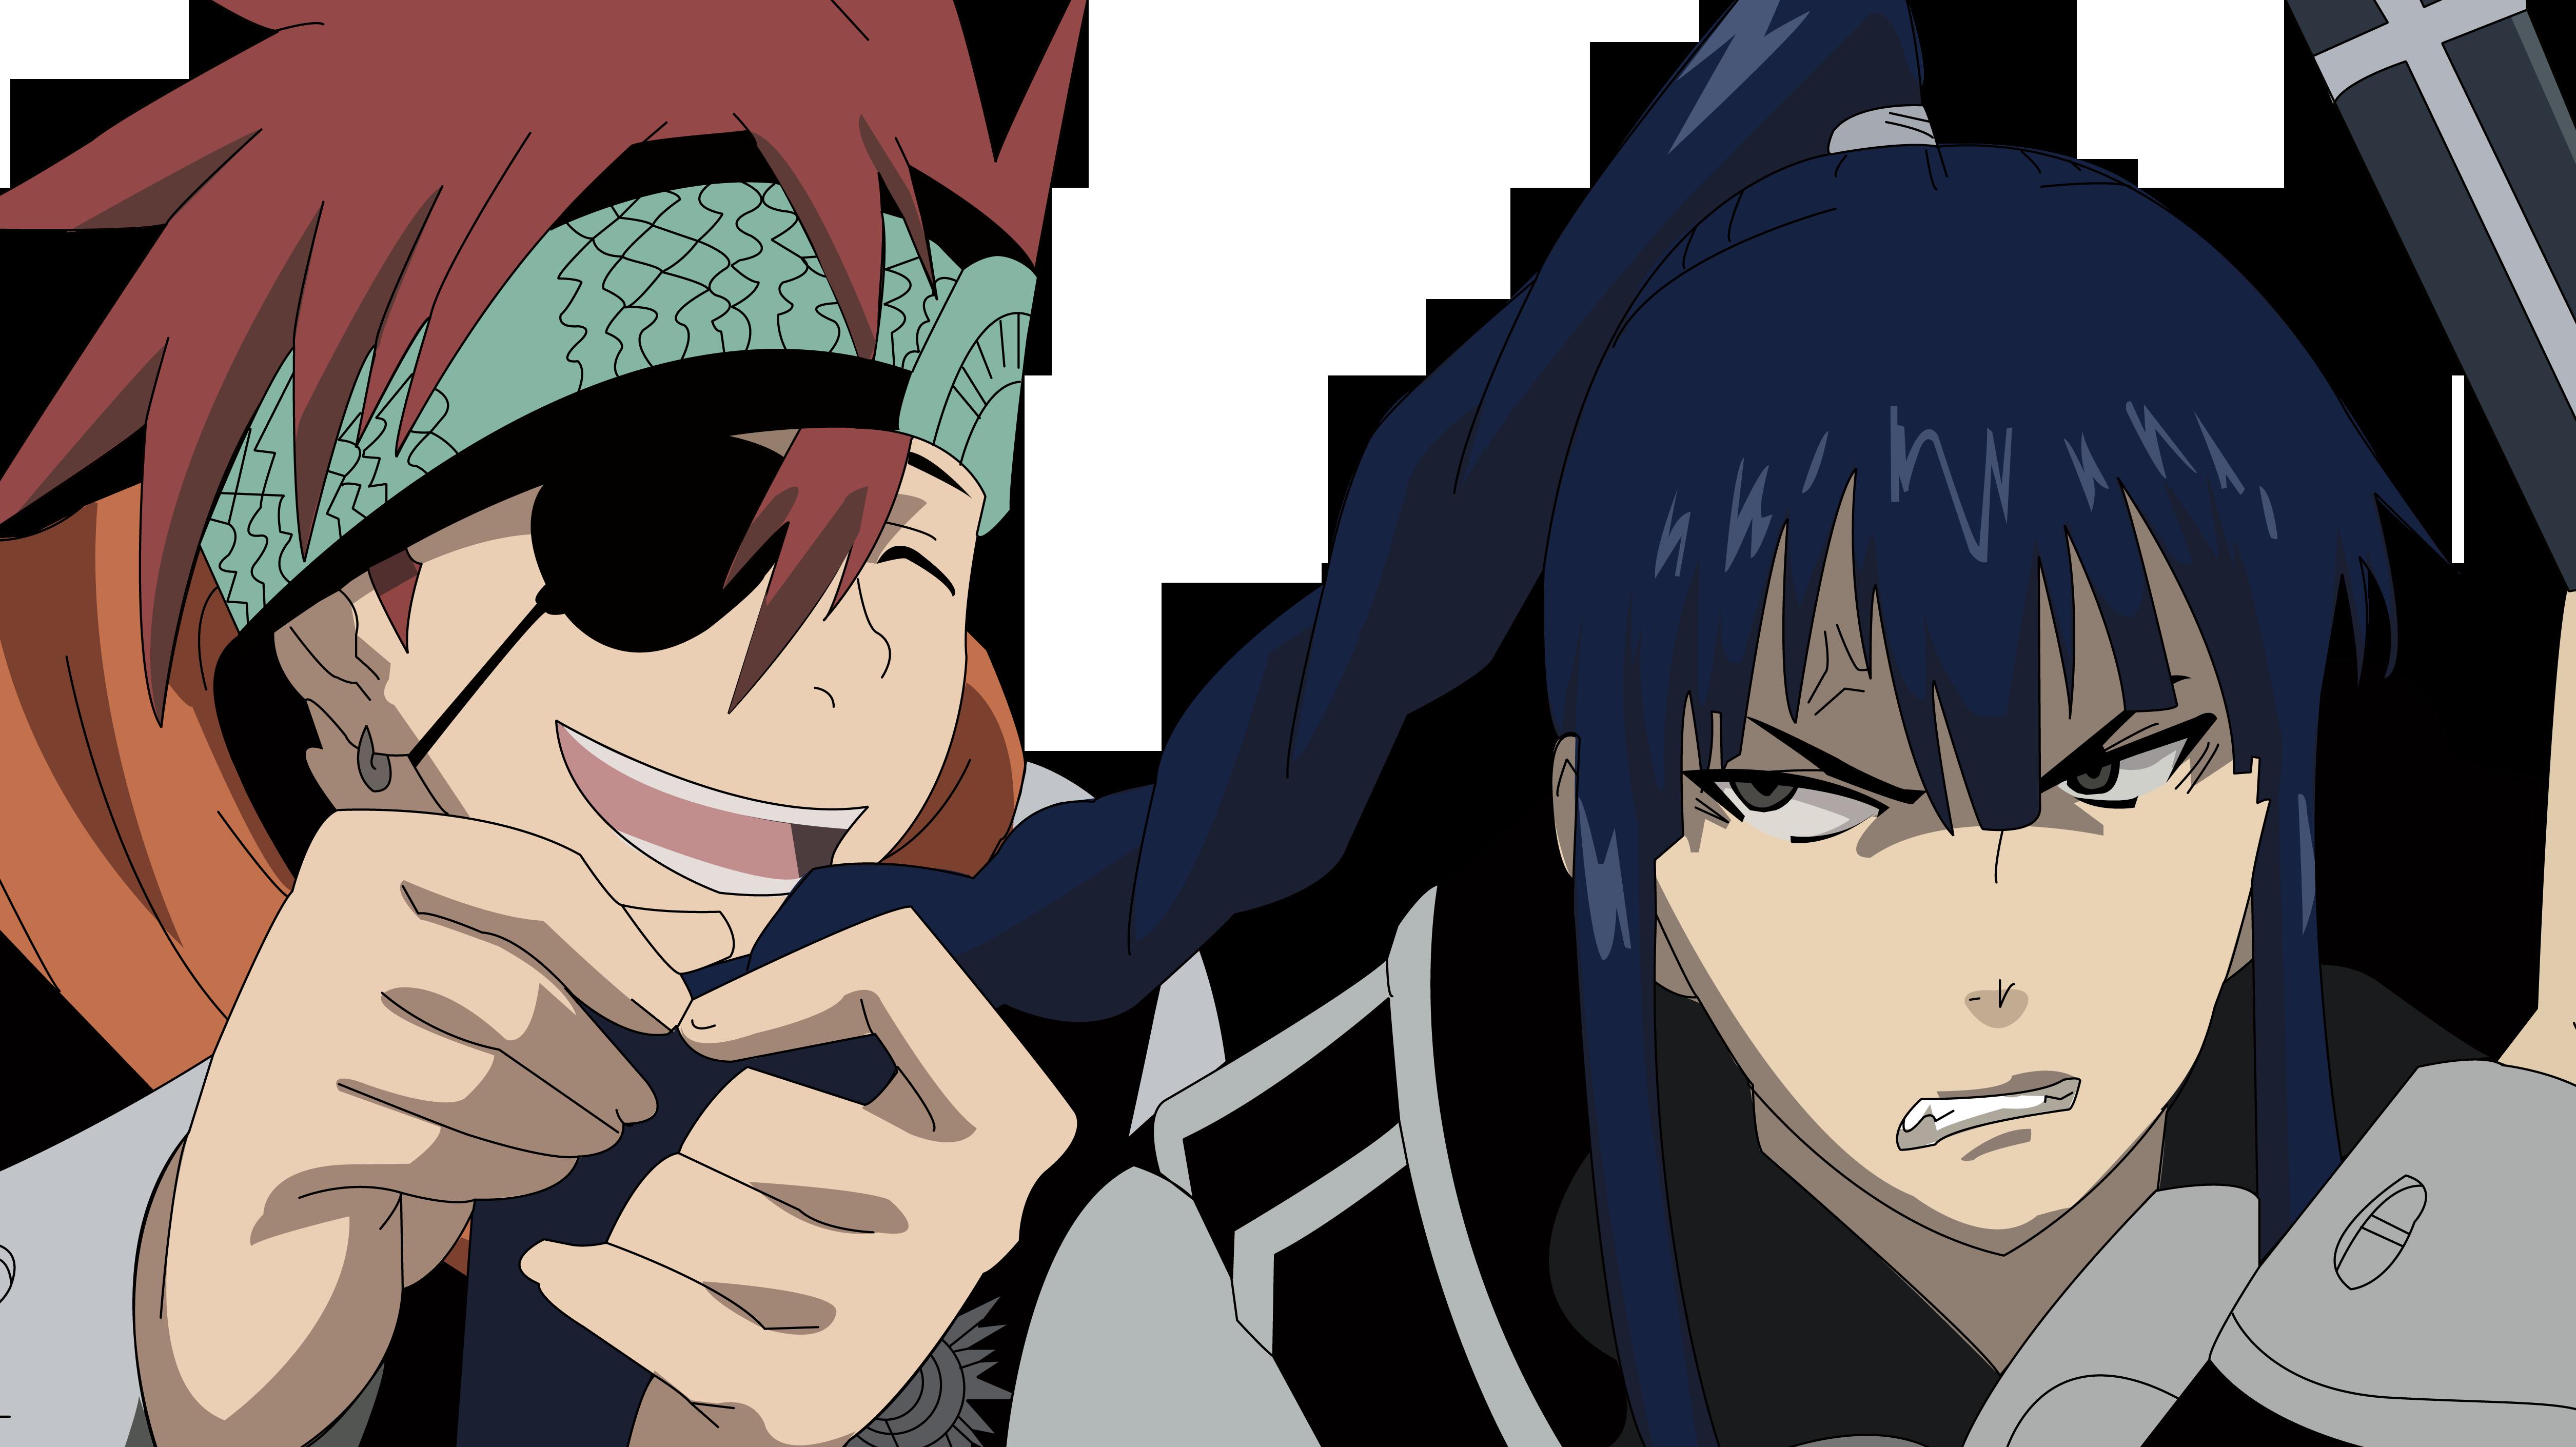 RateMyDrawings - Manga Talk - D.Gray-Man *anime OFFICAL thread* :D